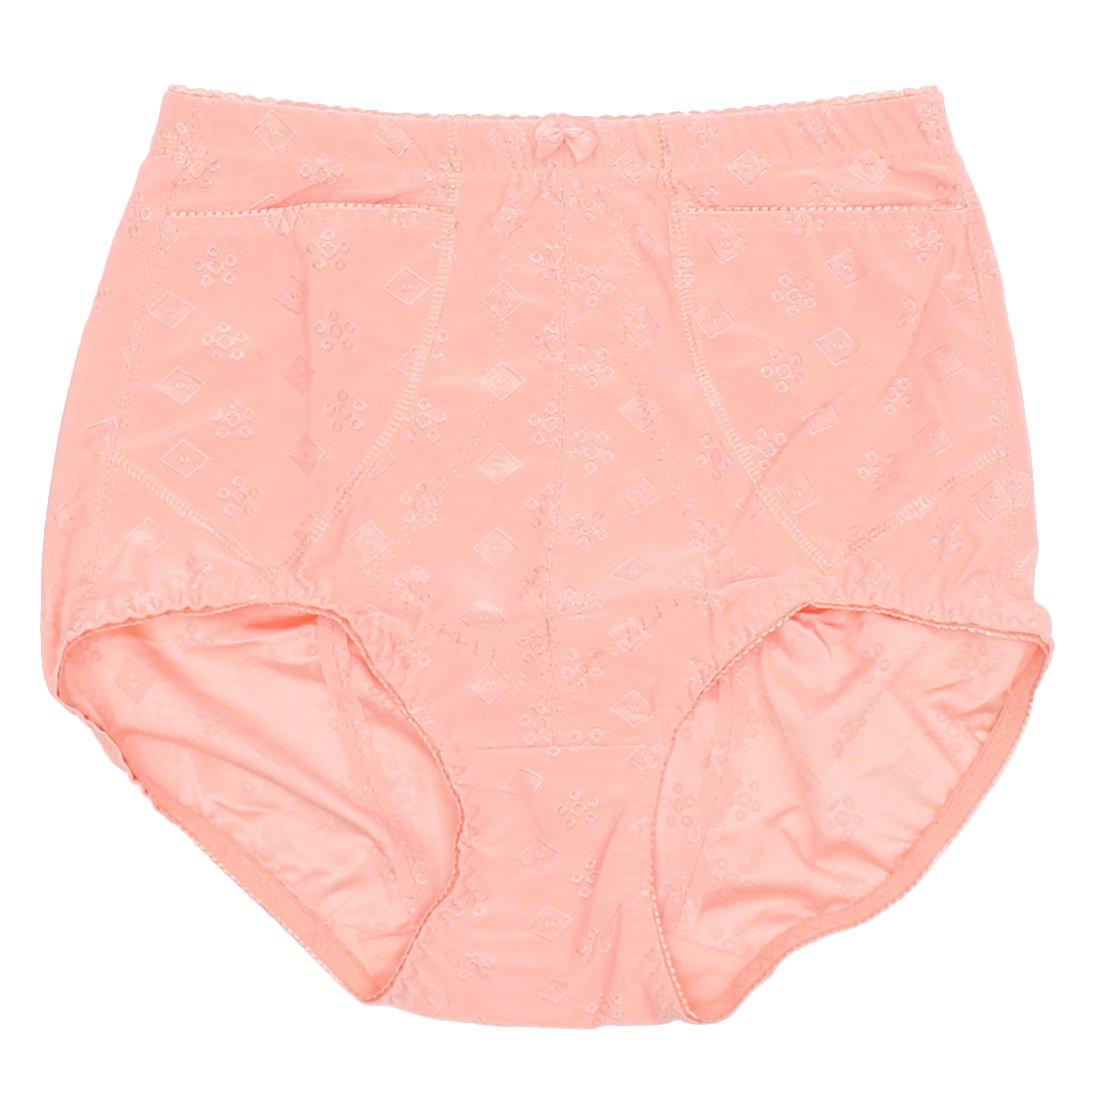 Lucii 12 Pack Hi-waisted Girdle Panties at Amazon Womens Clothing store: